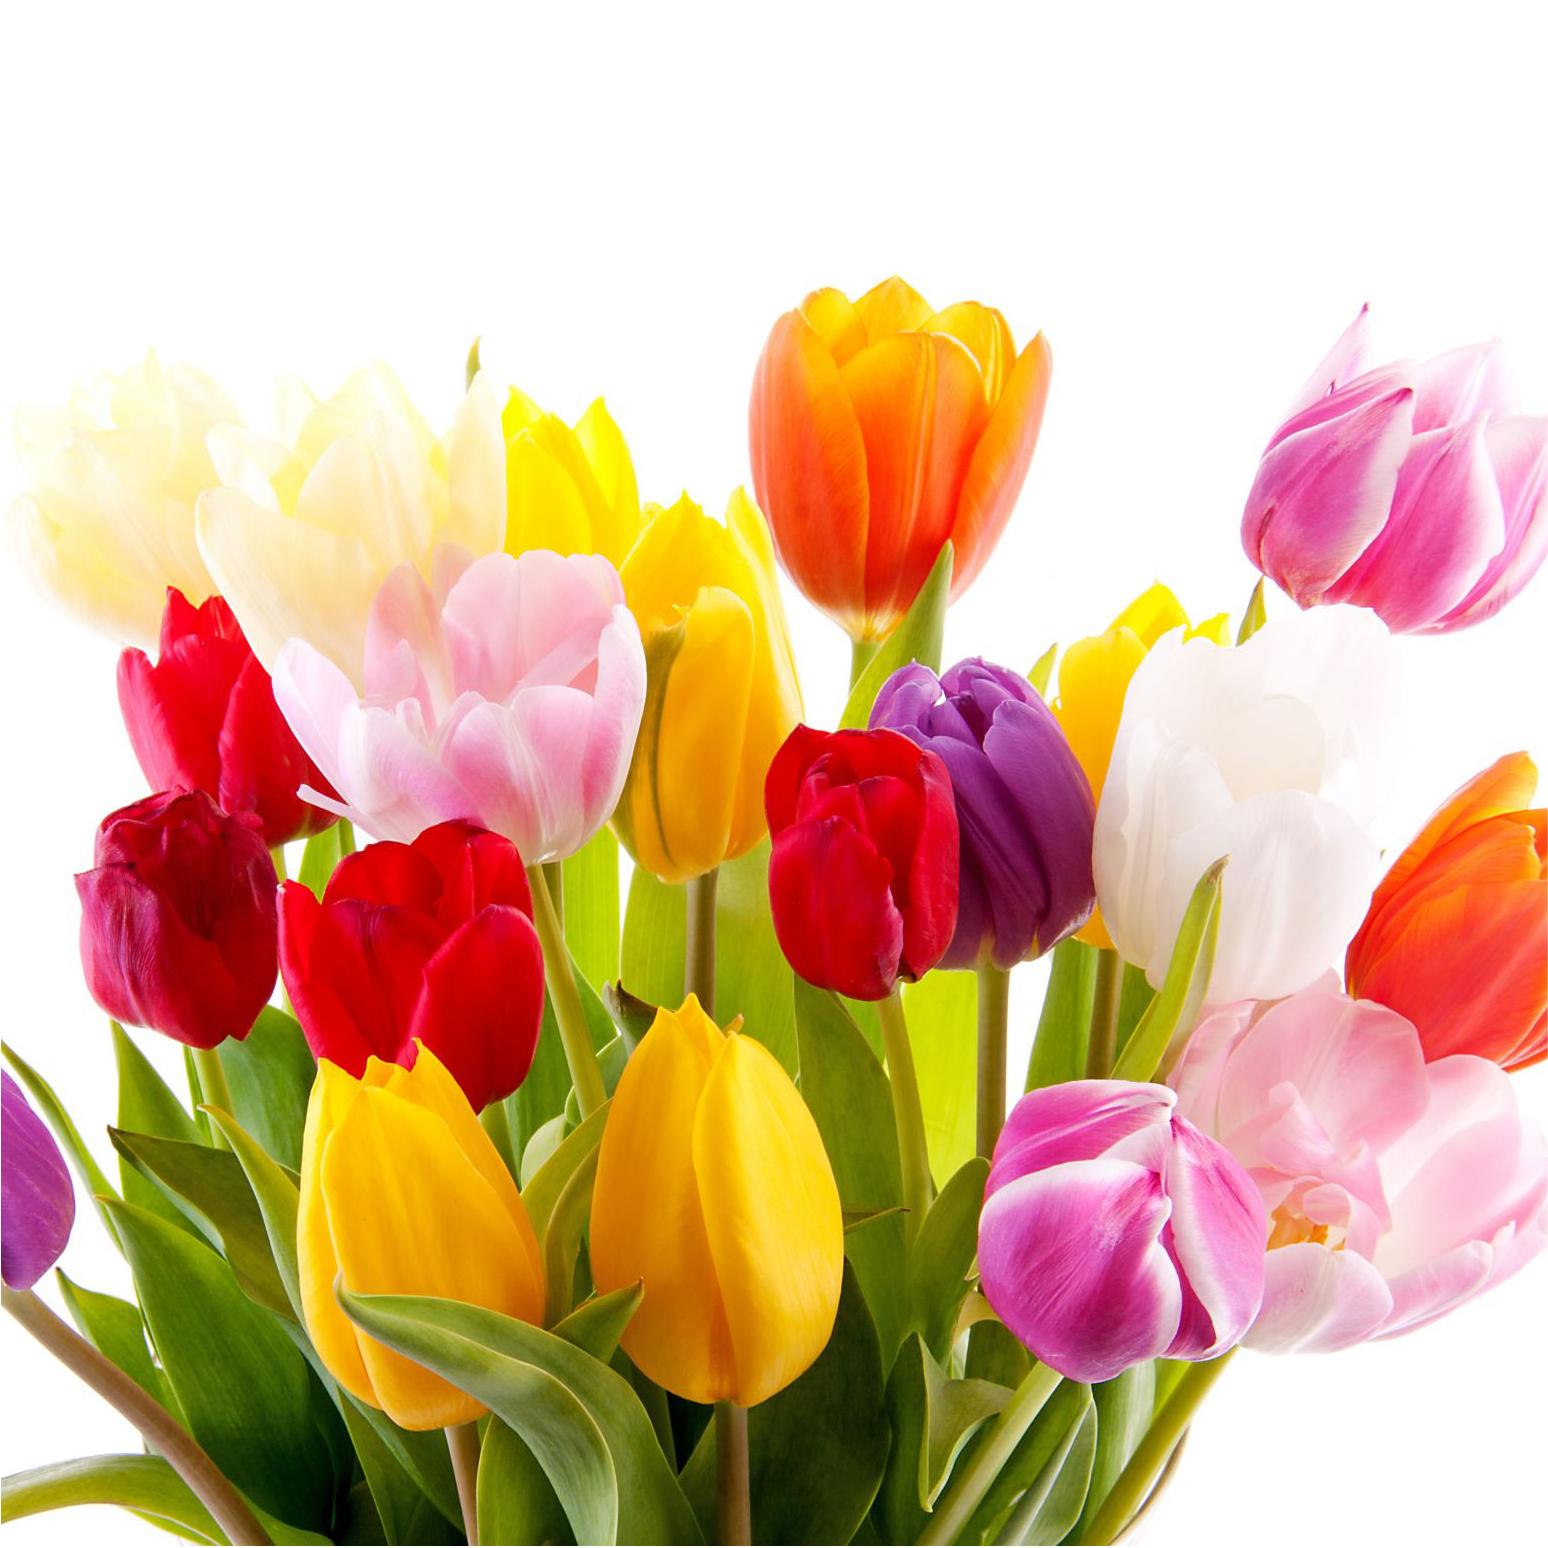 Картинки тюльпанов на 8 марта